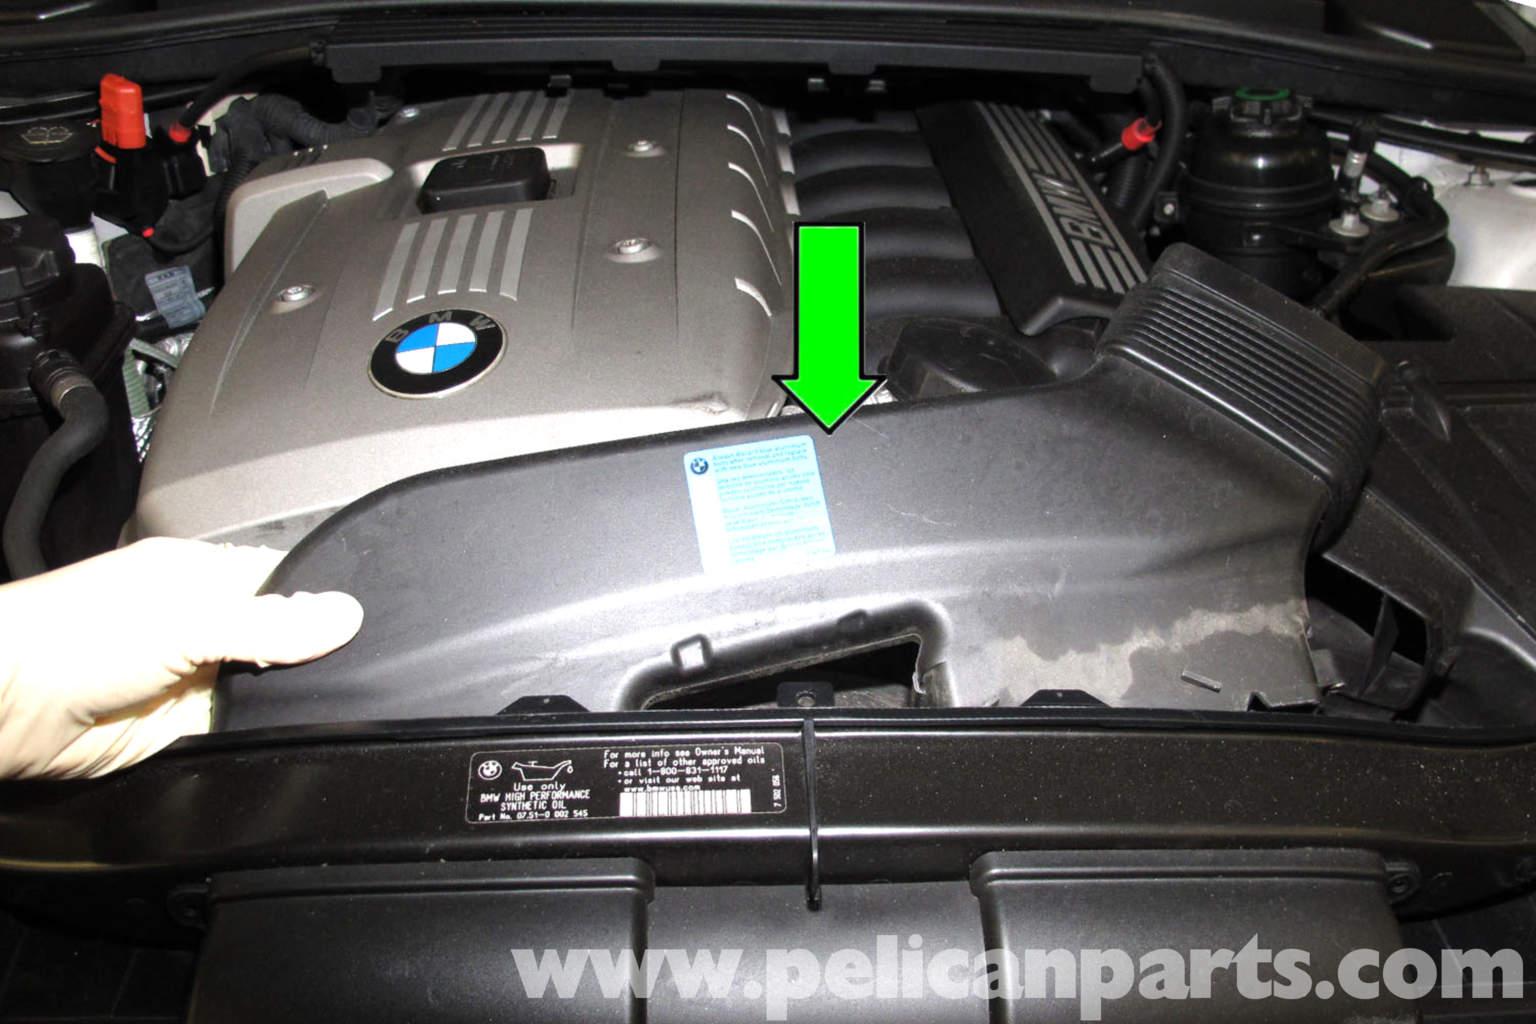 Bmw E90 Air Filter Replacement E91 E92 E93 Pelican Parts Diy Headlight Wiring Diagram Large Image